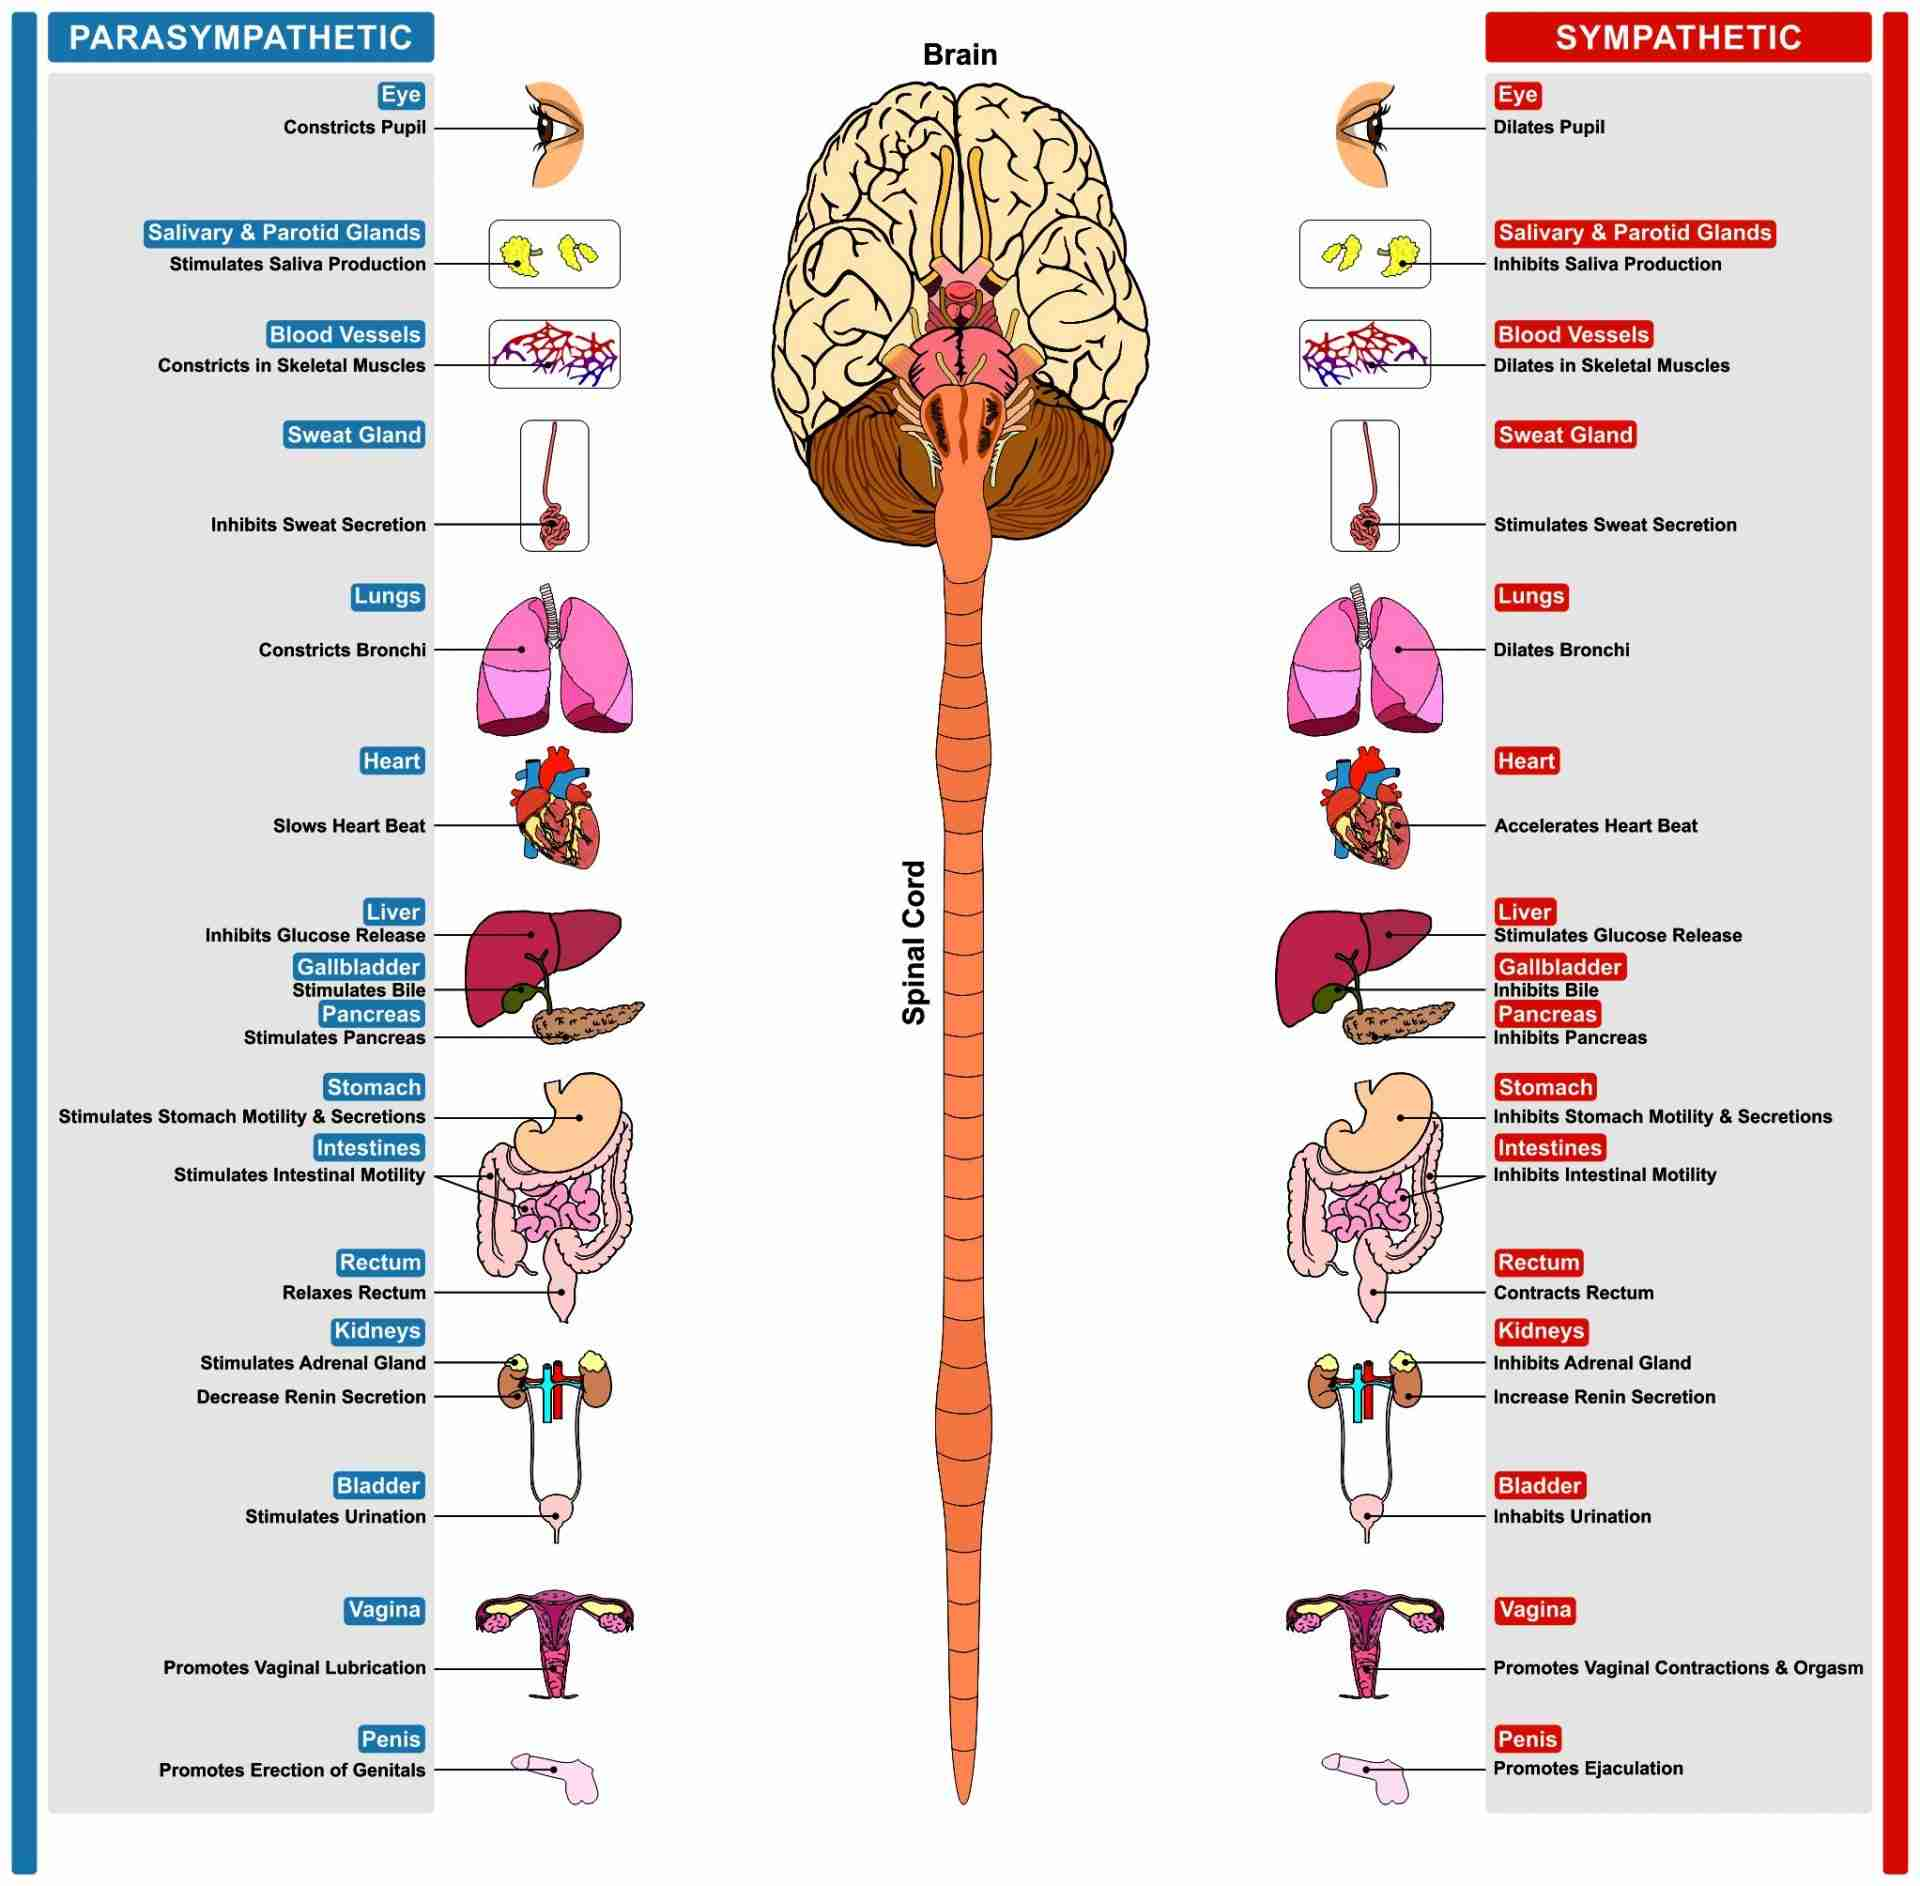 Parasympatethic Sympathetic Nervous System Side By Side